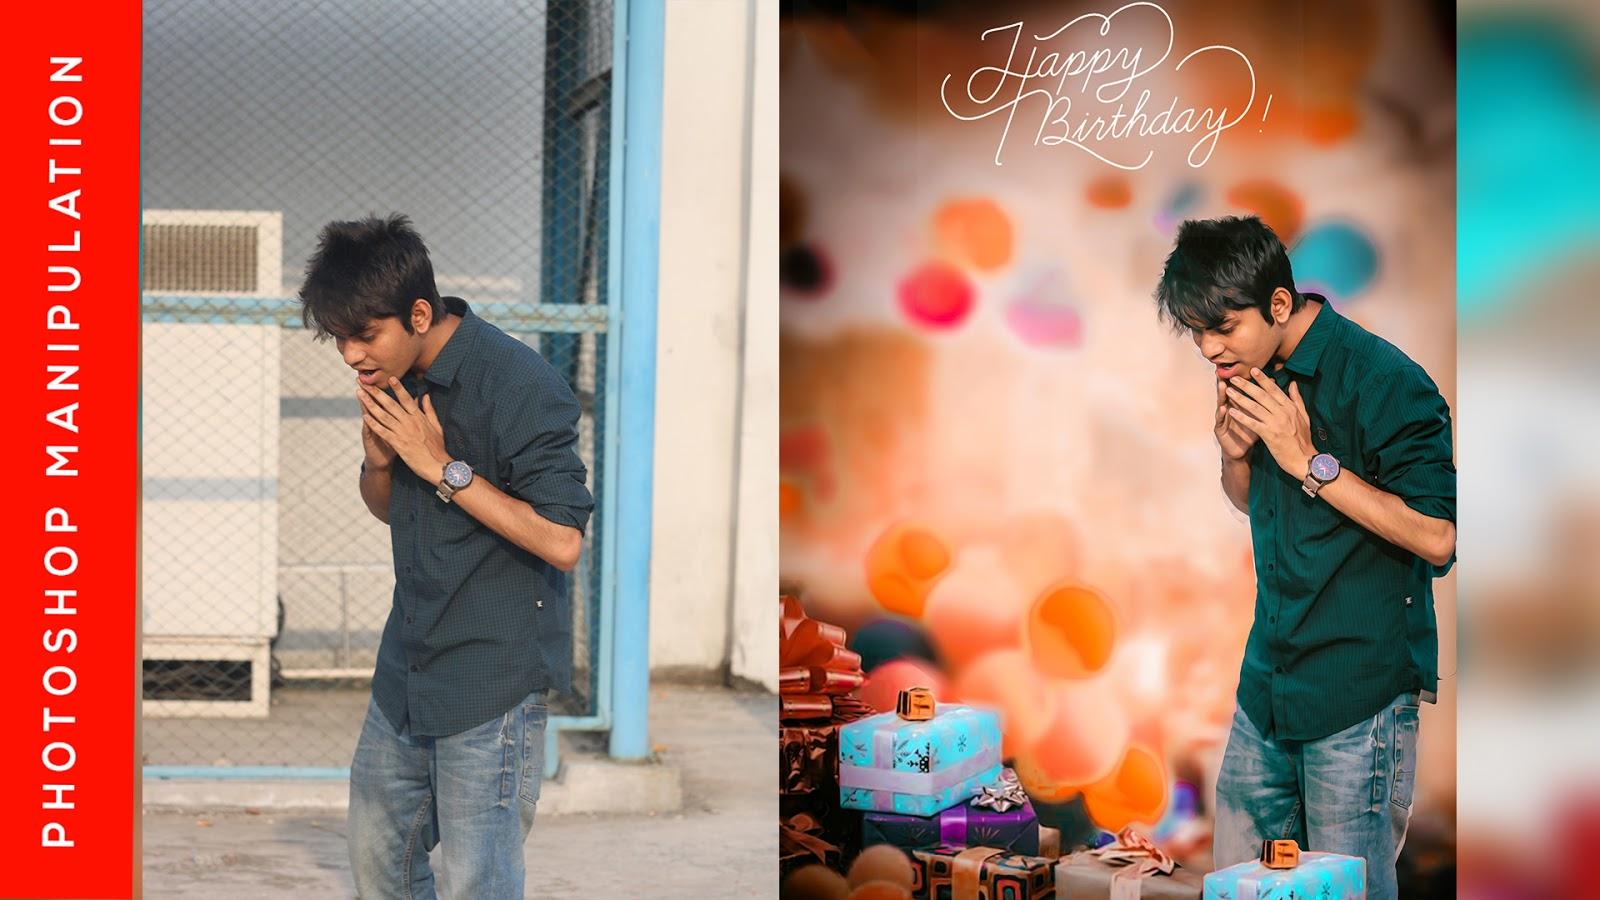 how to make birthday card on photoshop cc